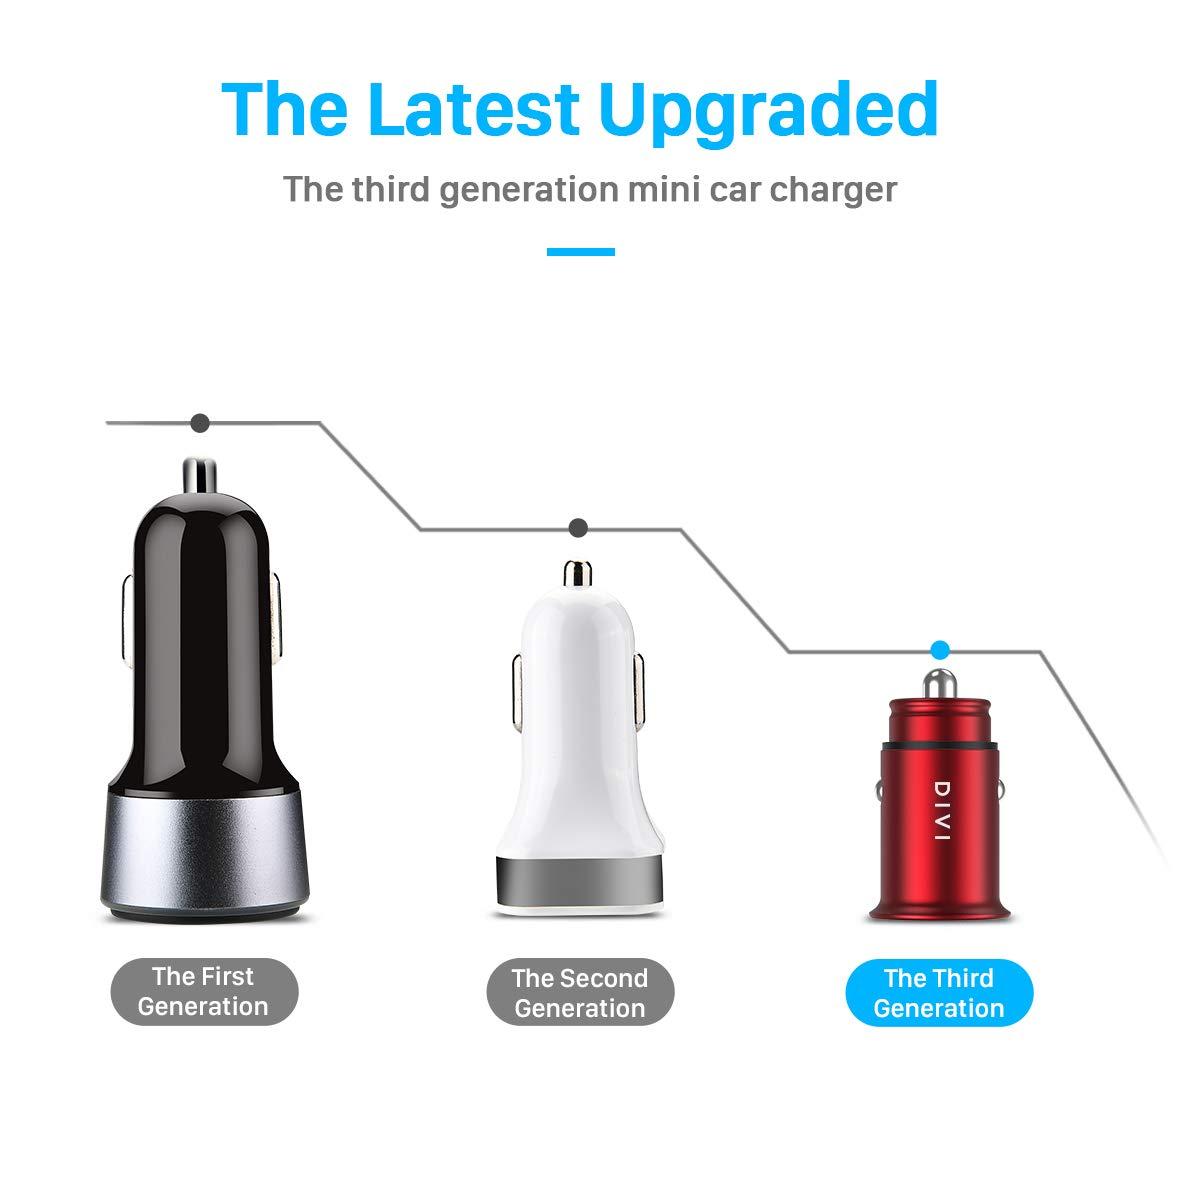 DIVI Cargador de Coche con Doble USB Puerto Cargador Móvil 5V/4.8A/24W, Adaptador Automóvil con Fast Charging Mini Small Size para Phone X / 8/8 Plus / 7, ...